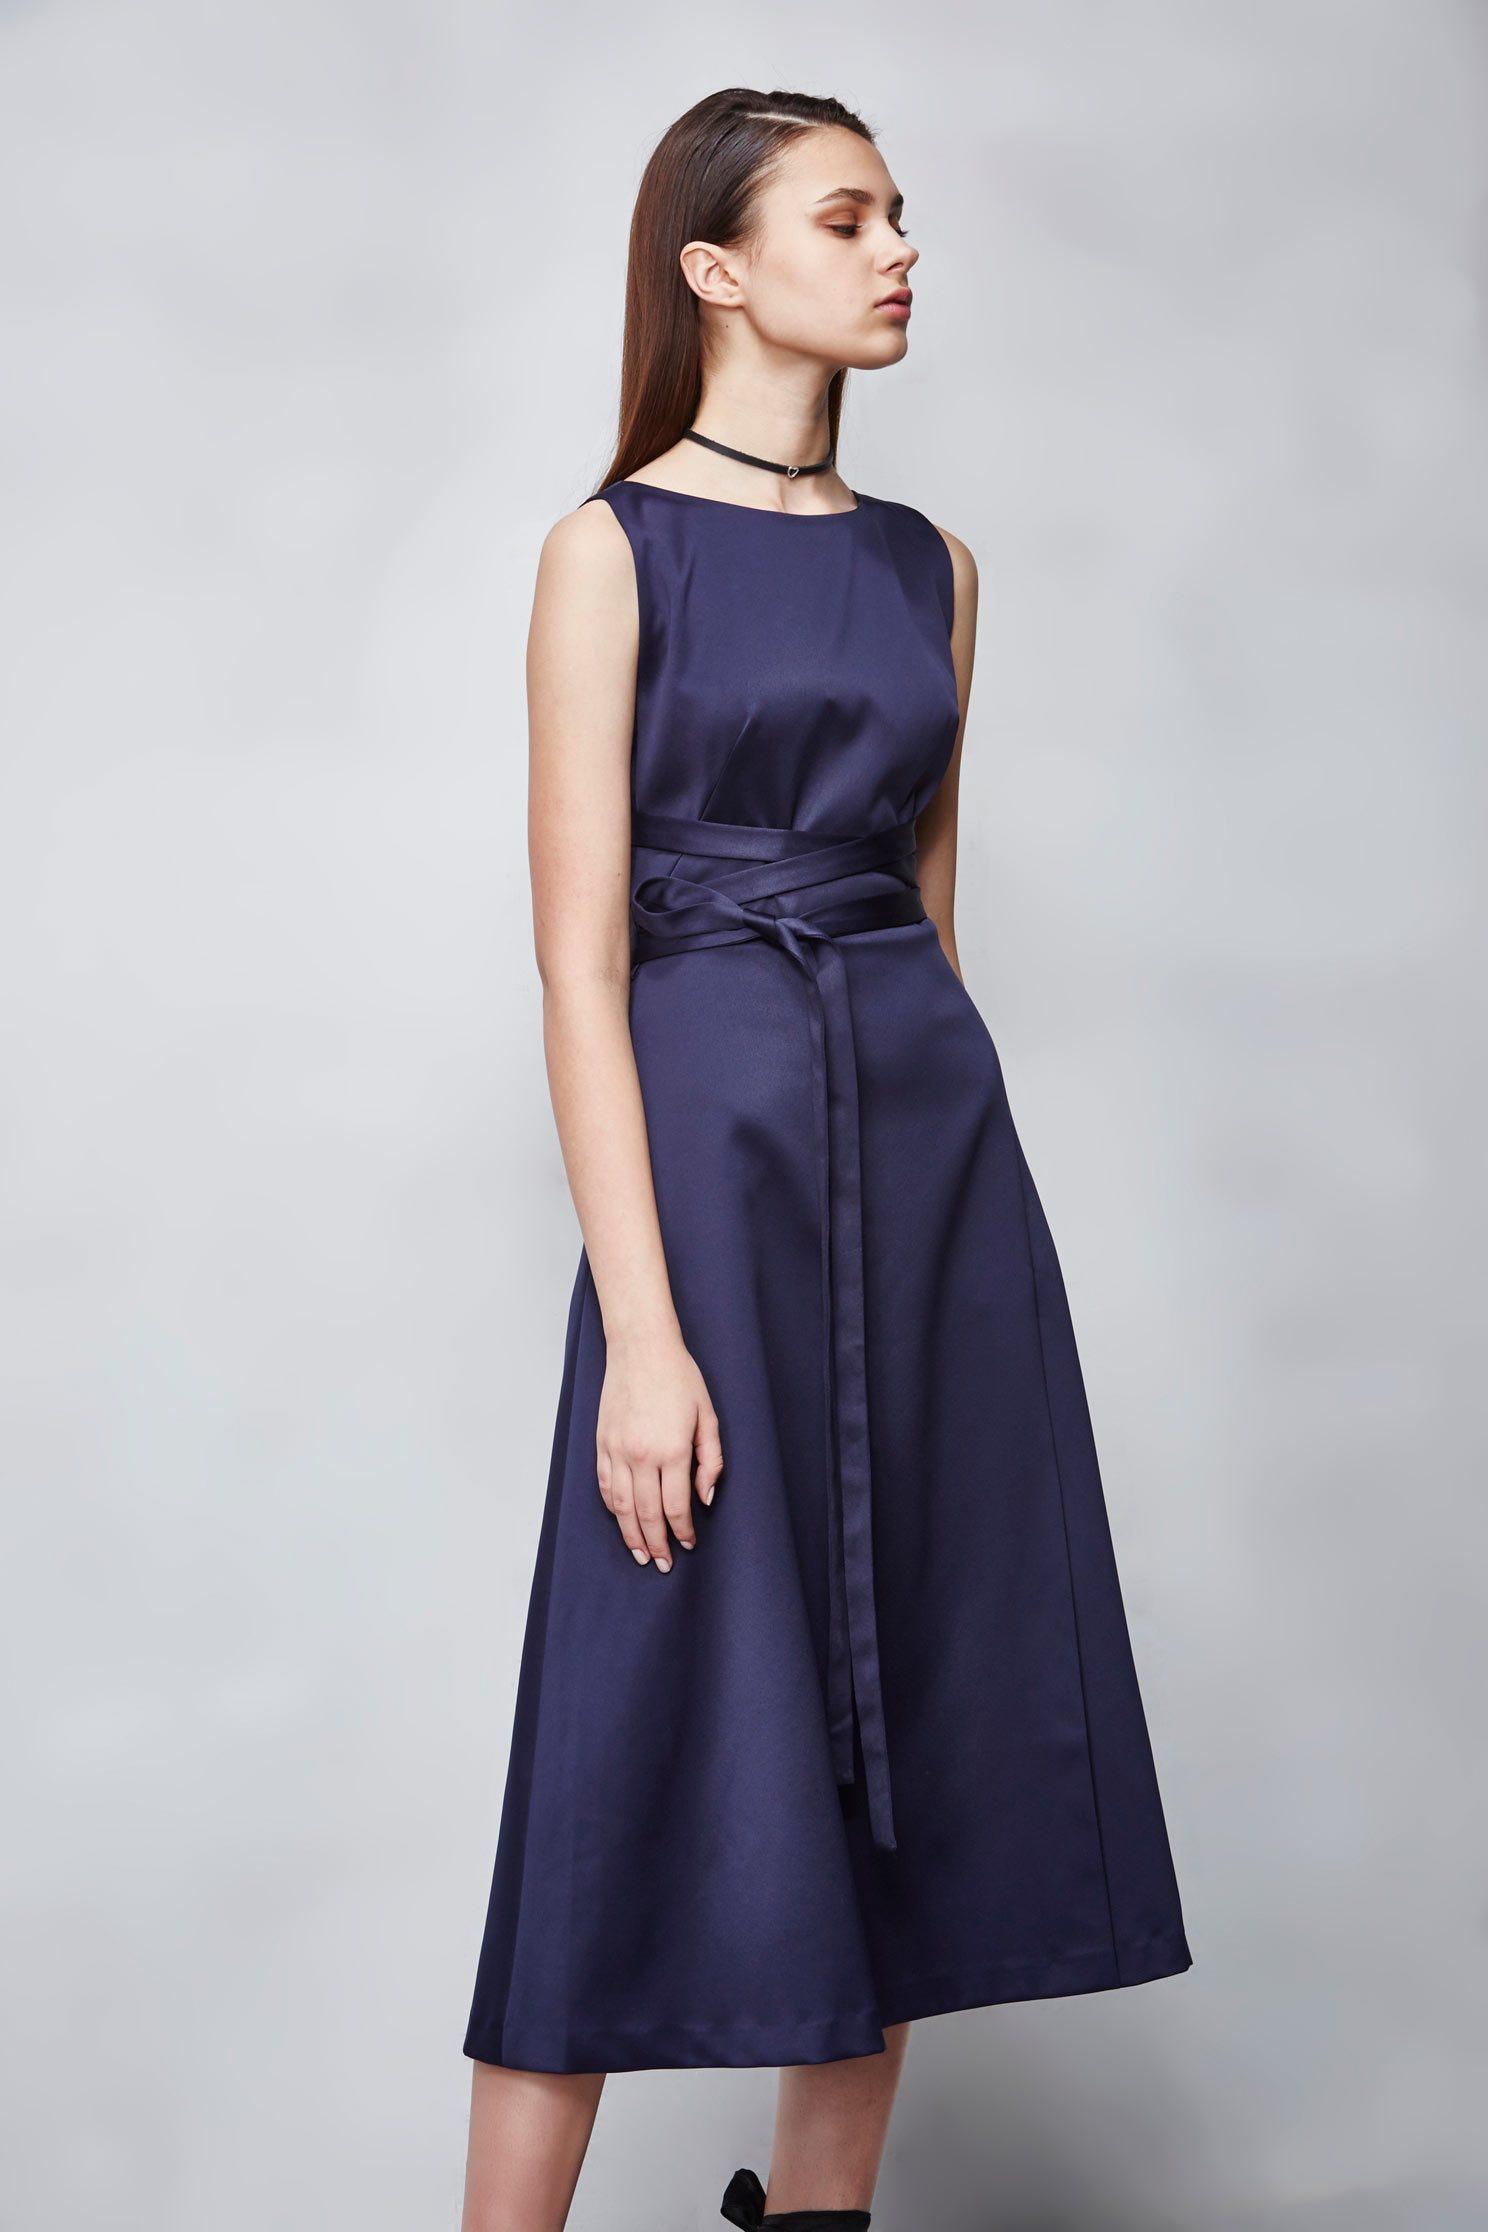 Cross ribbon blue satin dress,Cocktail Dress,無袖洋裝,Evening Wear,Lace,Lace Dress